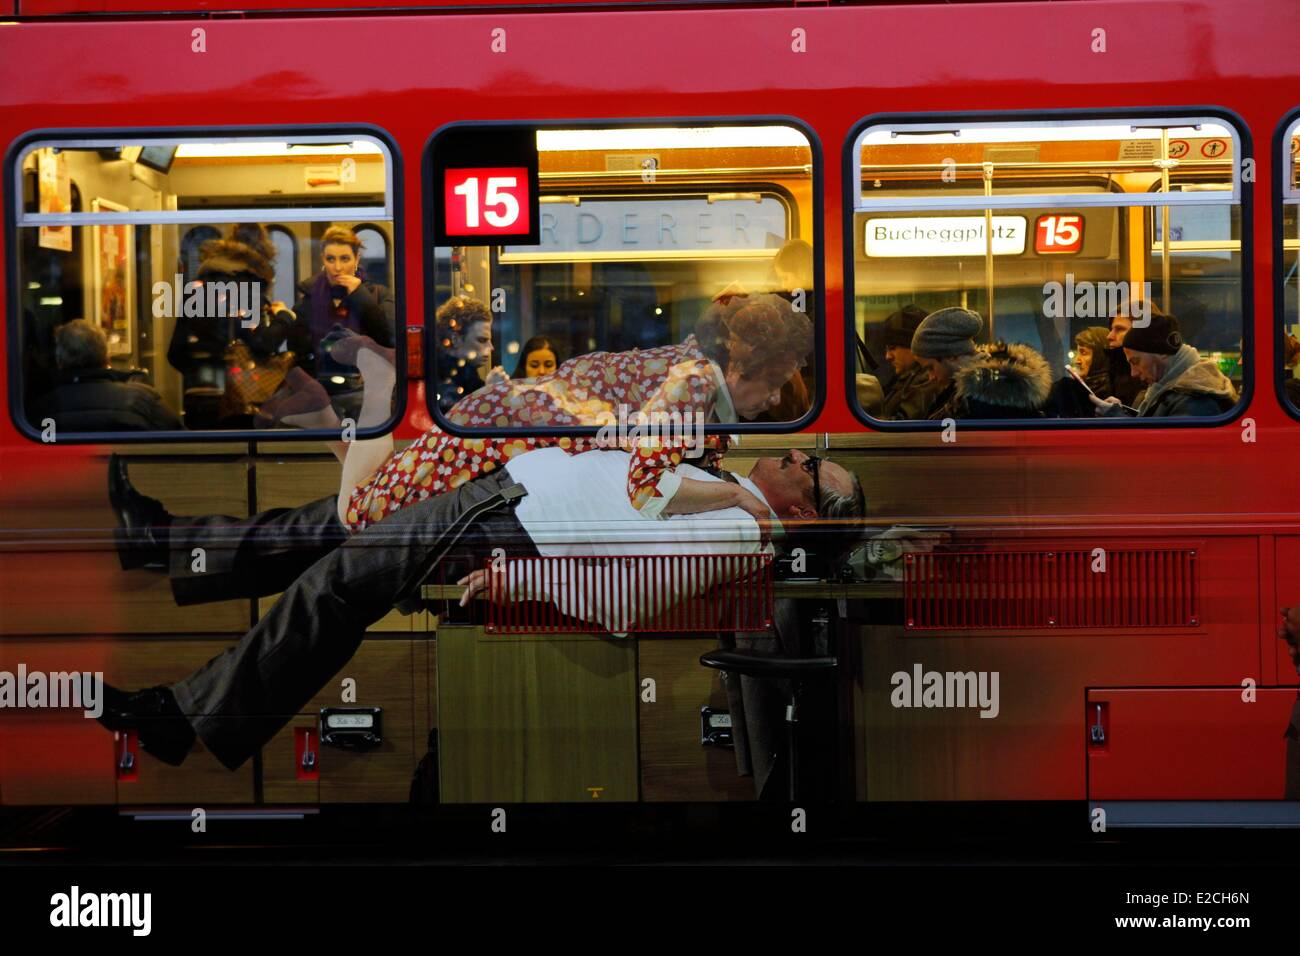 Svizzera, Zurigo tram verniciato Immagini Stock